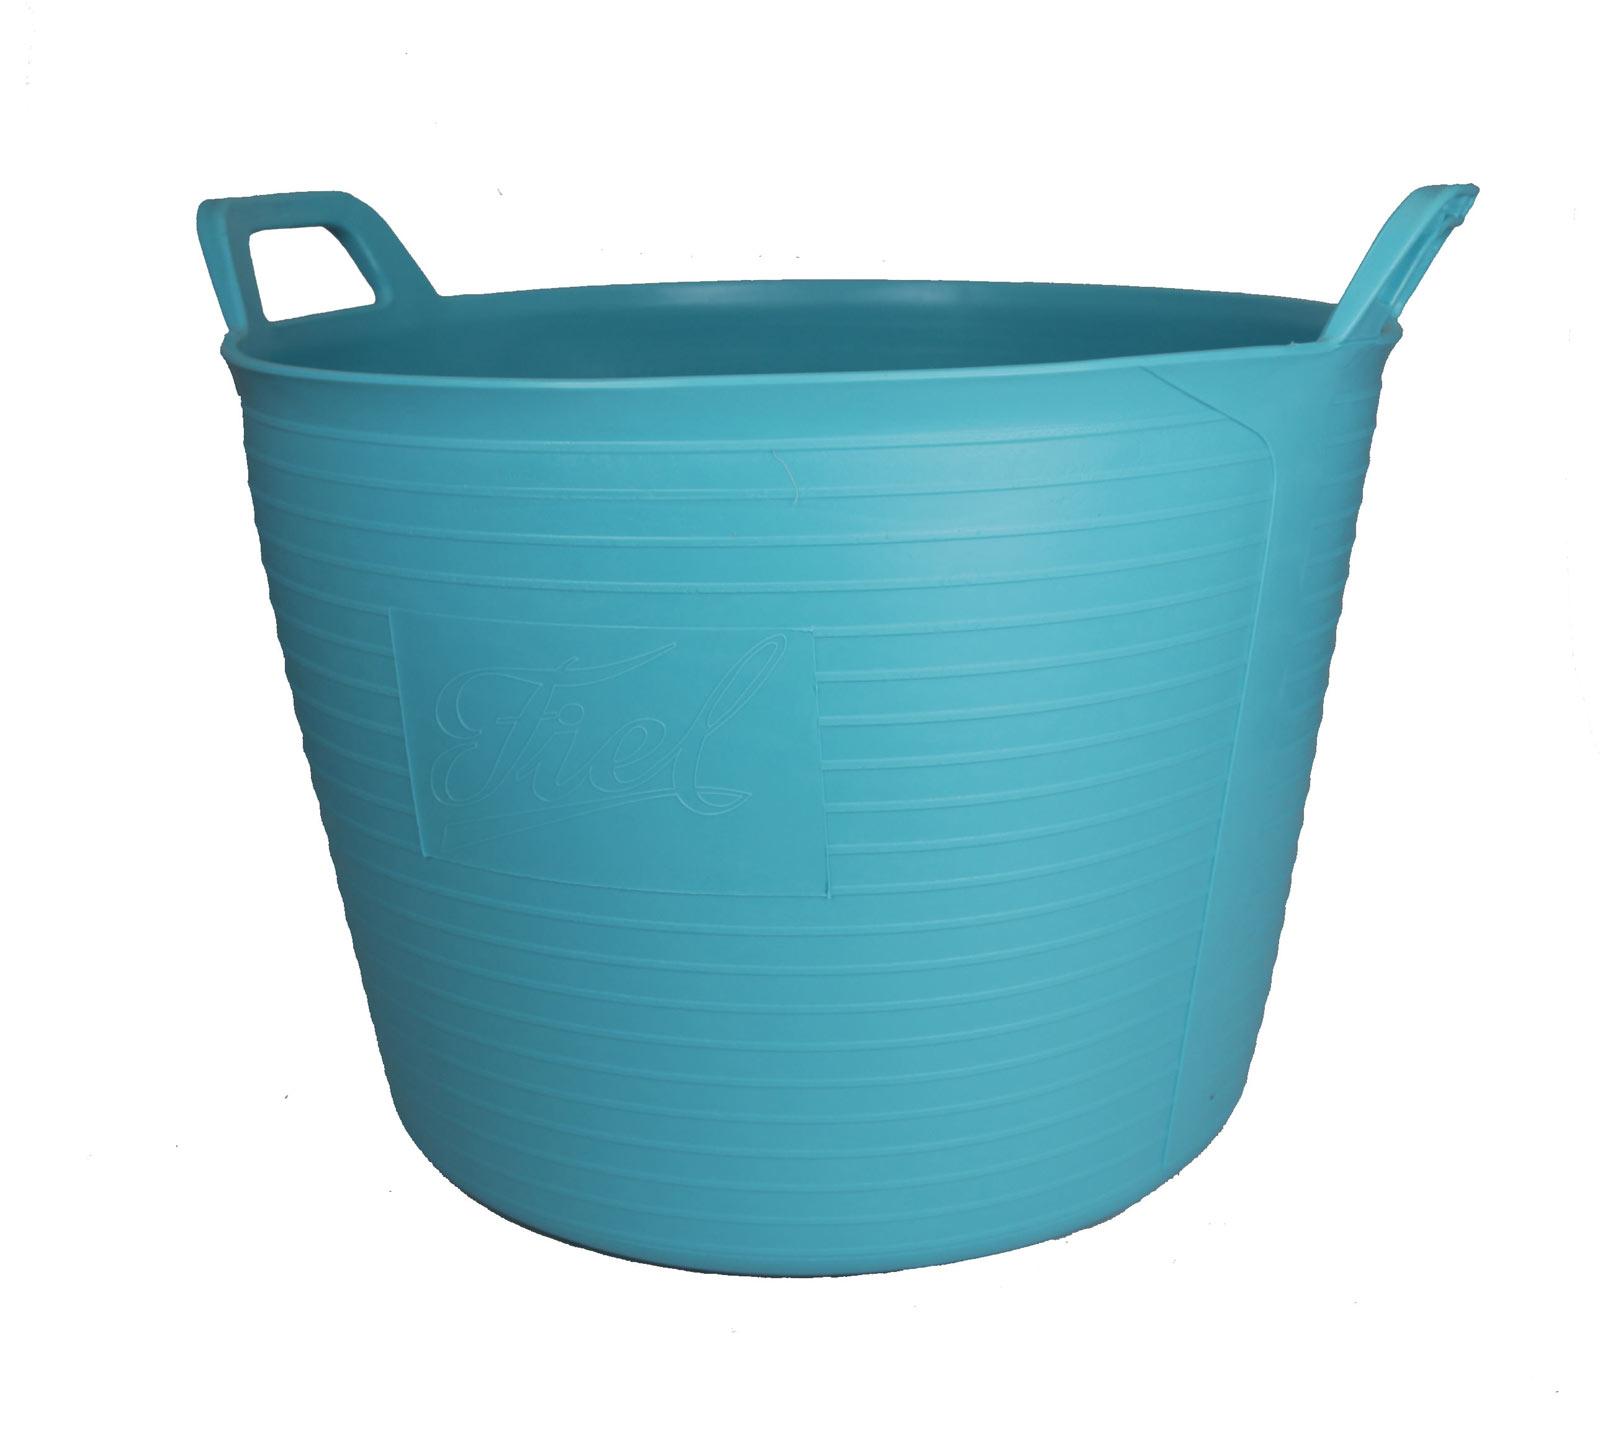 Fiel Trug Tub Aqua 10 5 Gallon Garden Artisans Llc